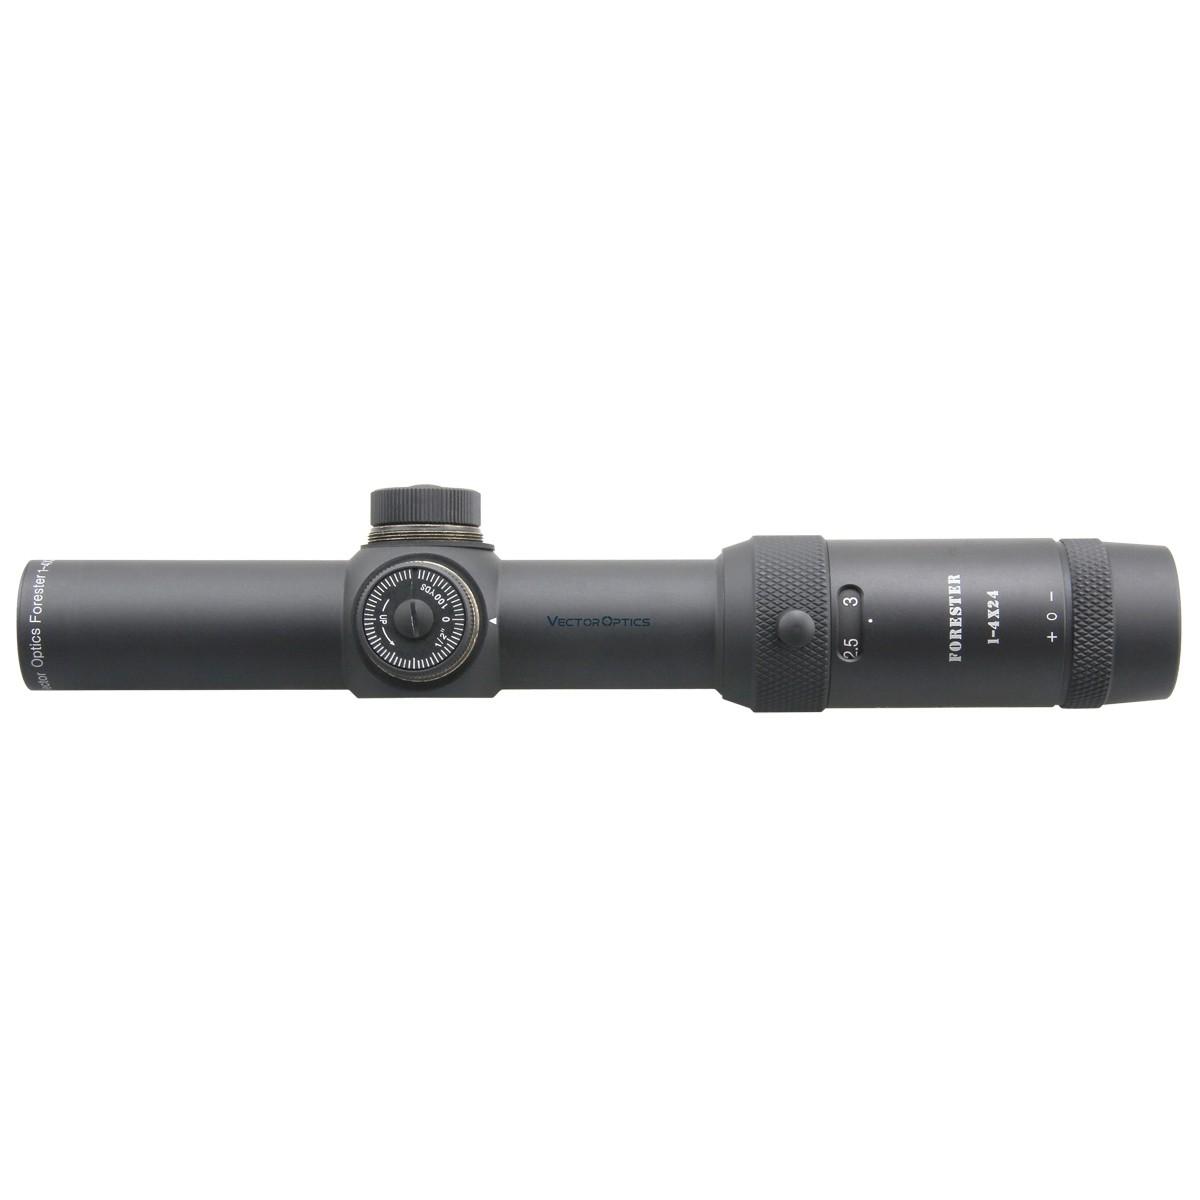 Forester 1-4x24SFP Riflescope